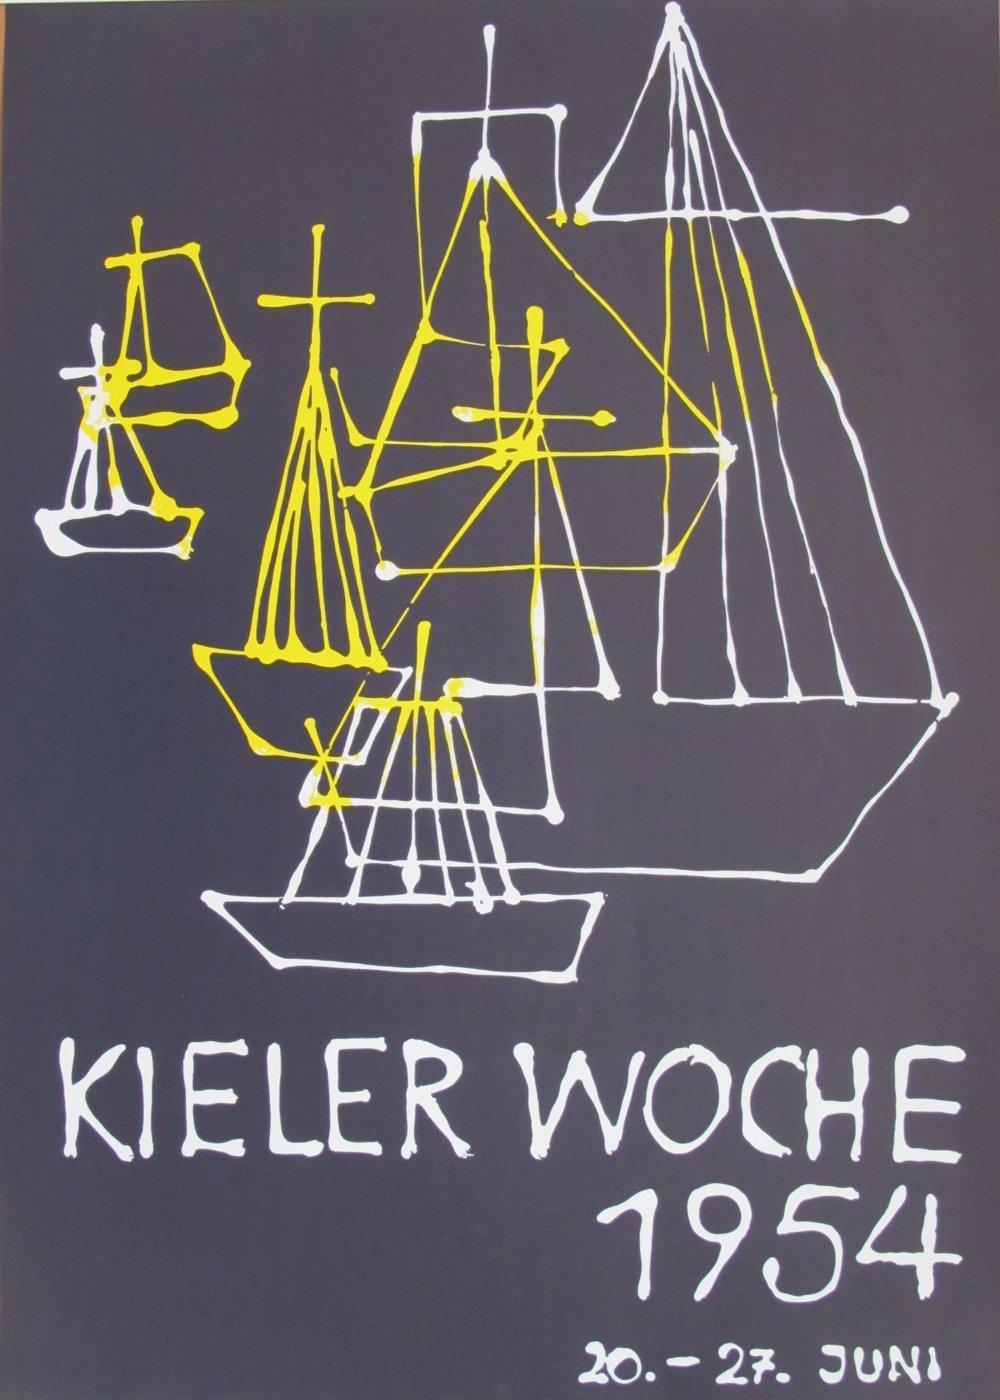 ShipSail_Kieler_Woche_Poster.jpg